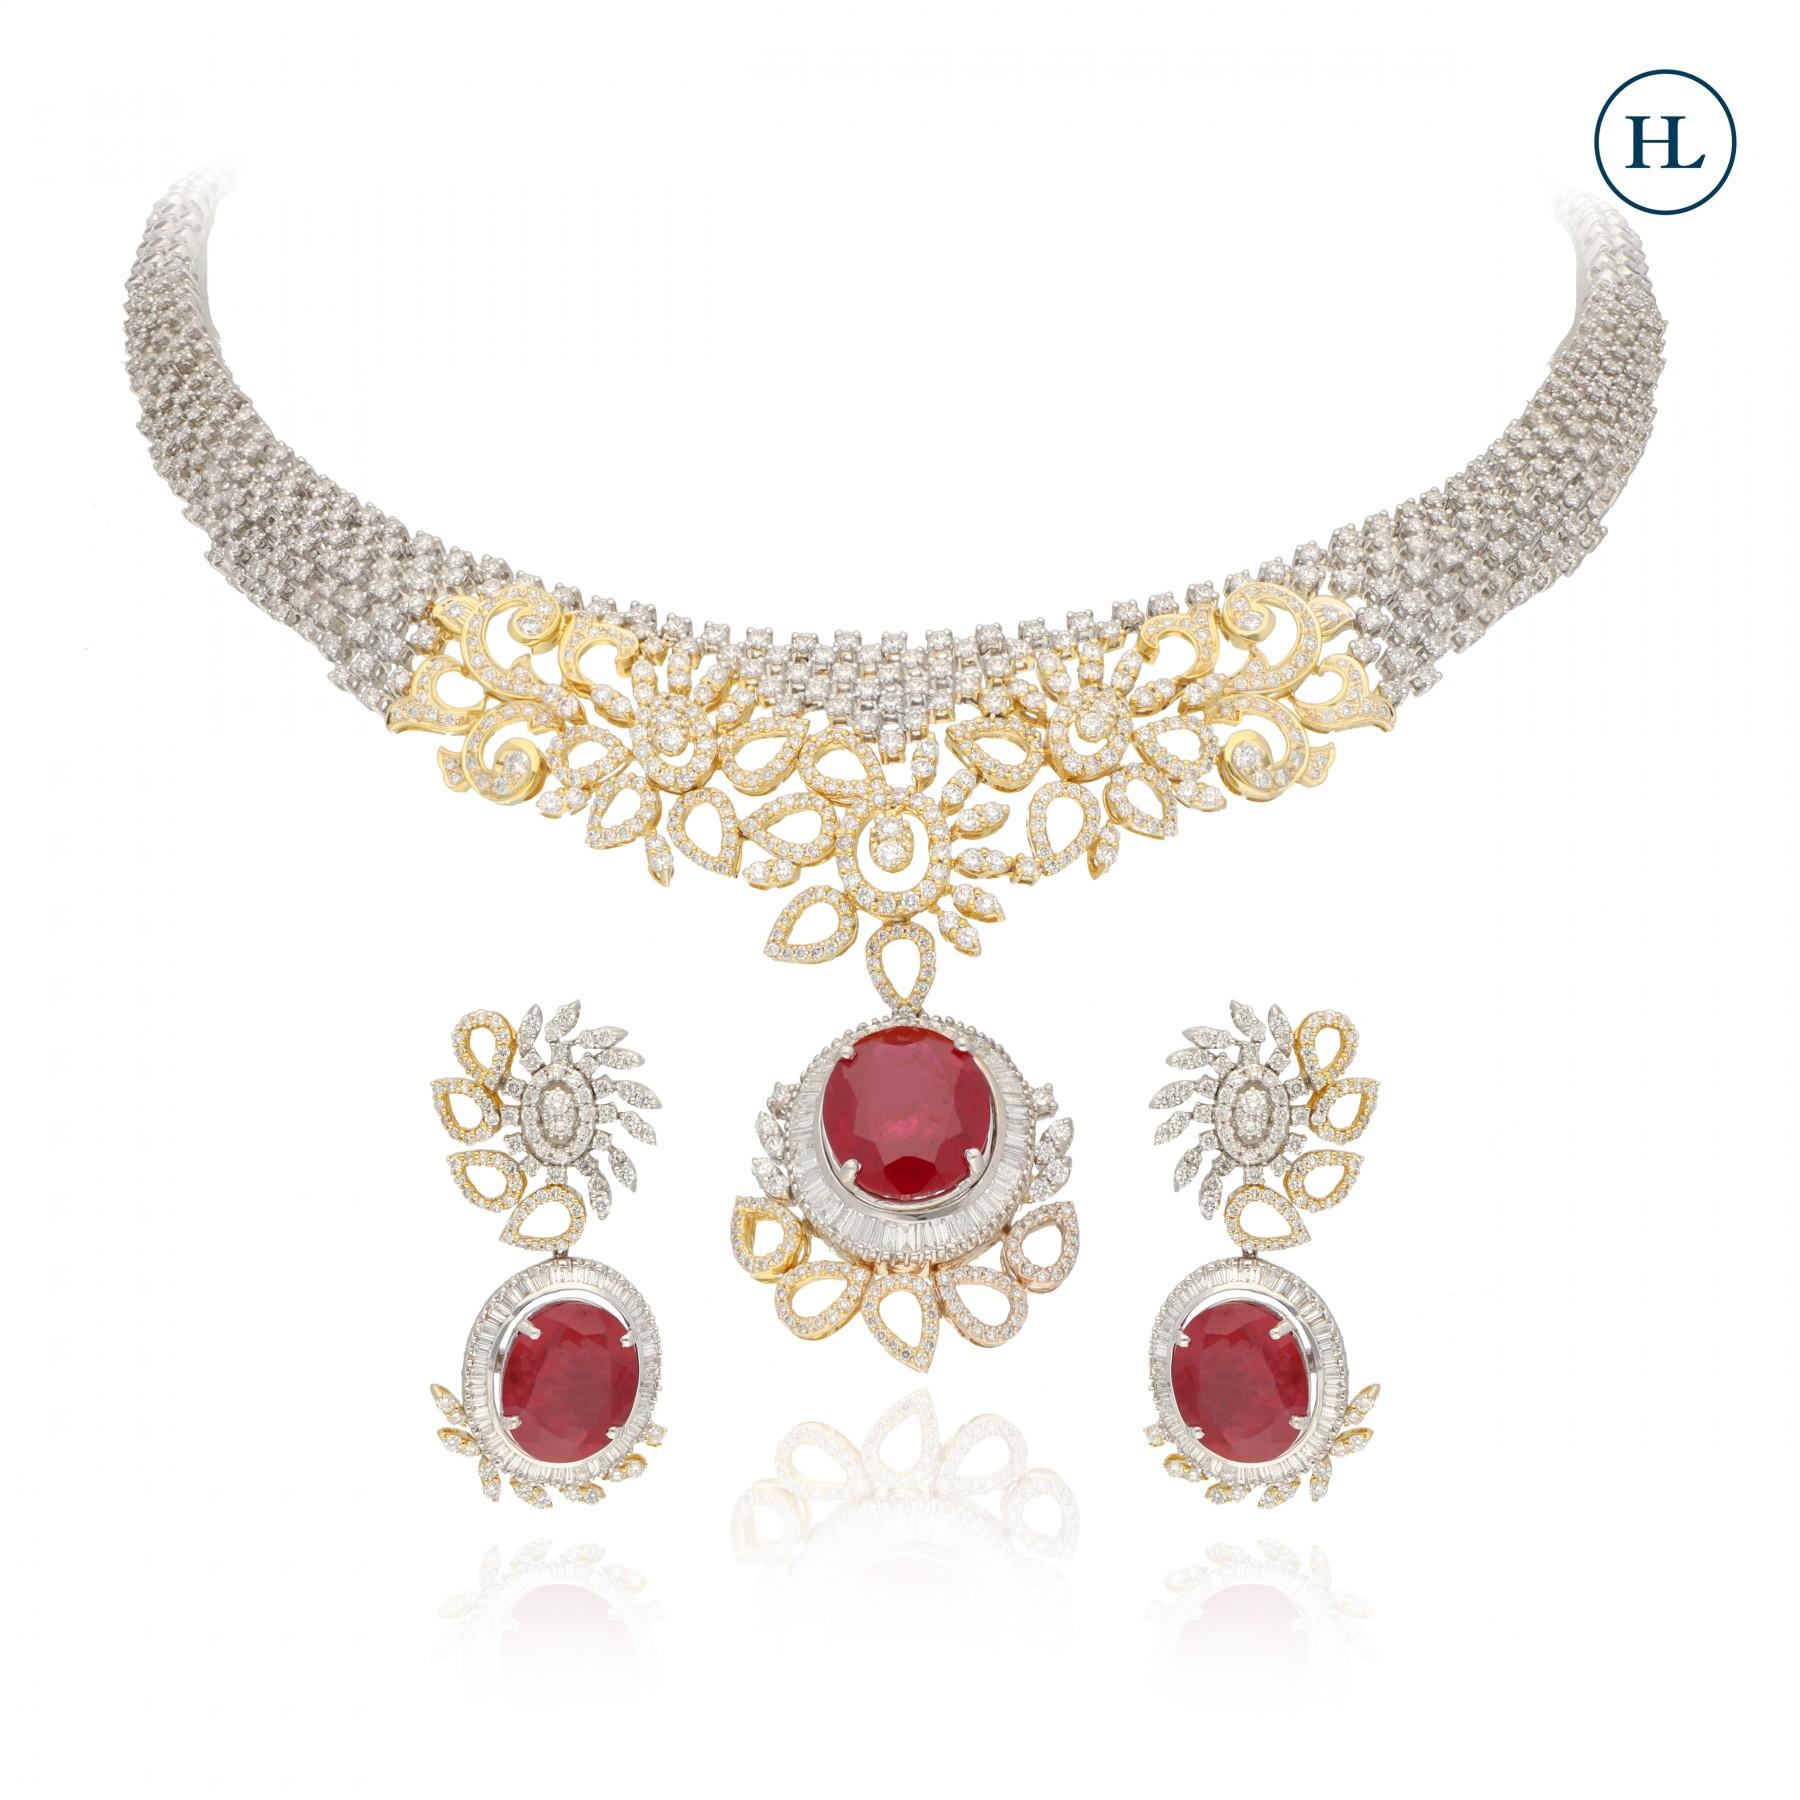 Onyx & Diamond Necklace Set